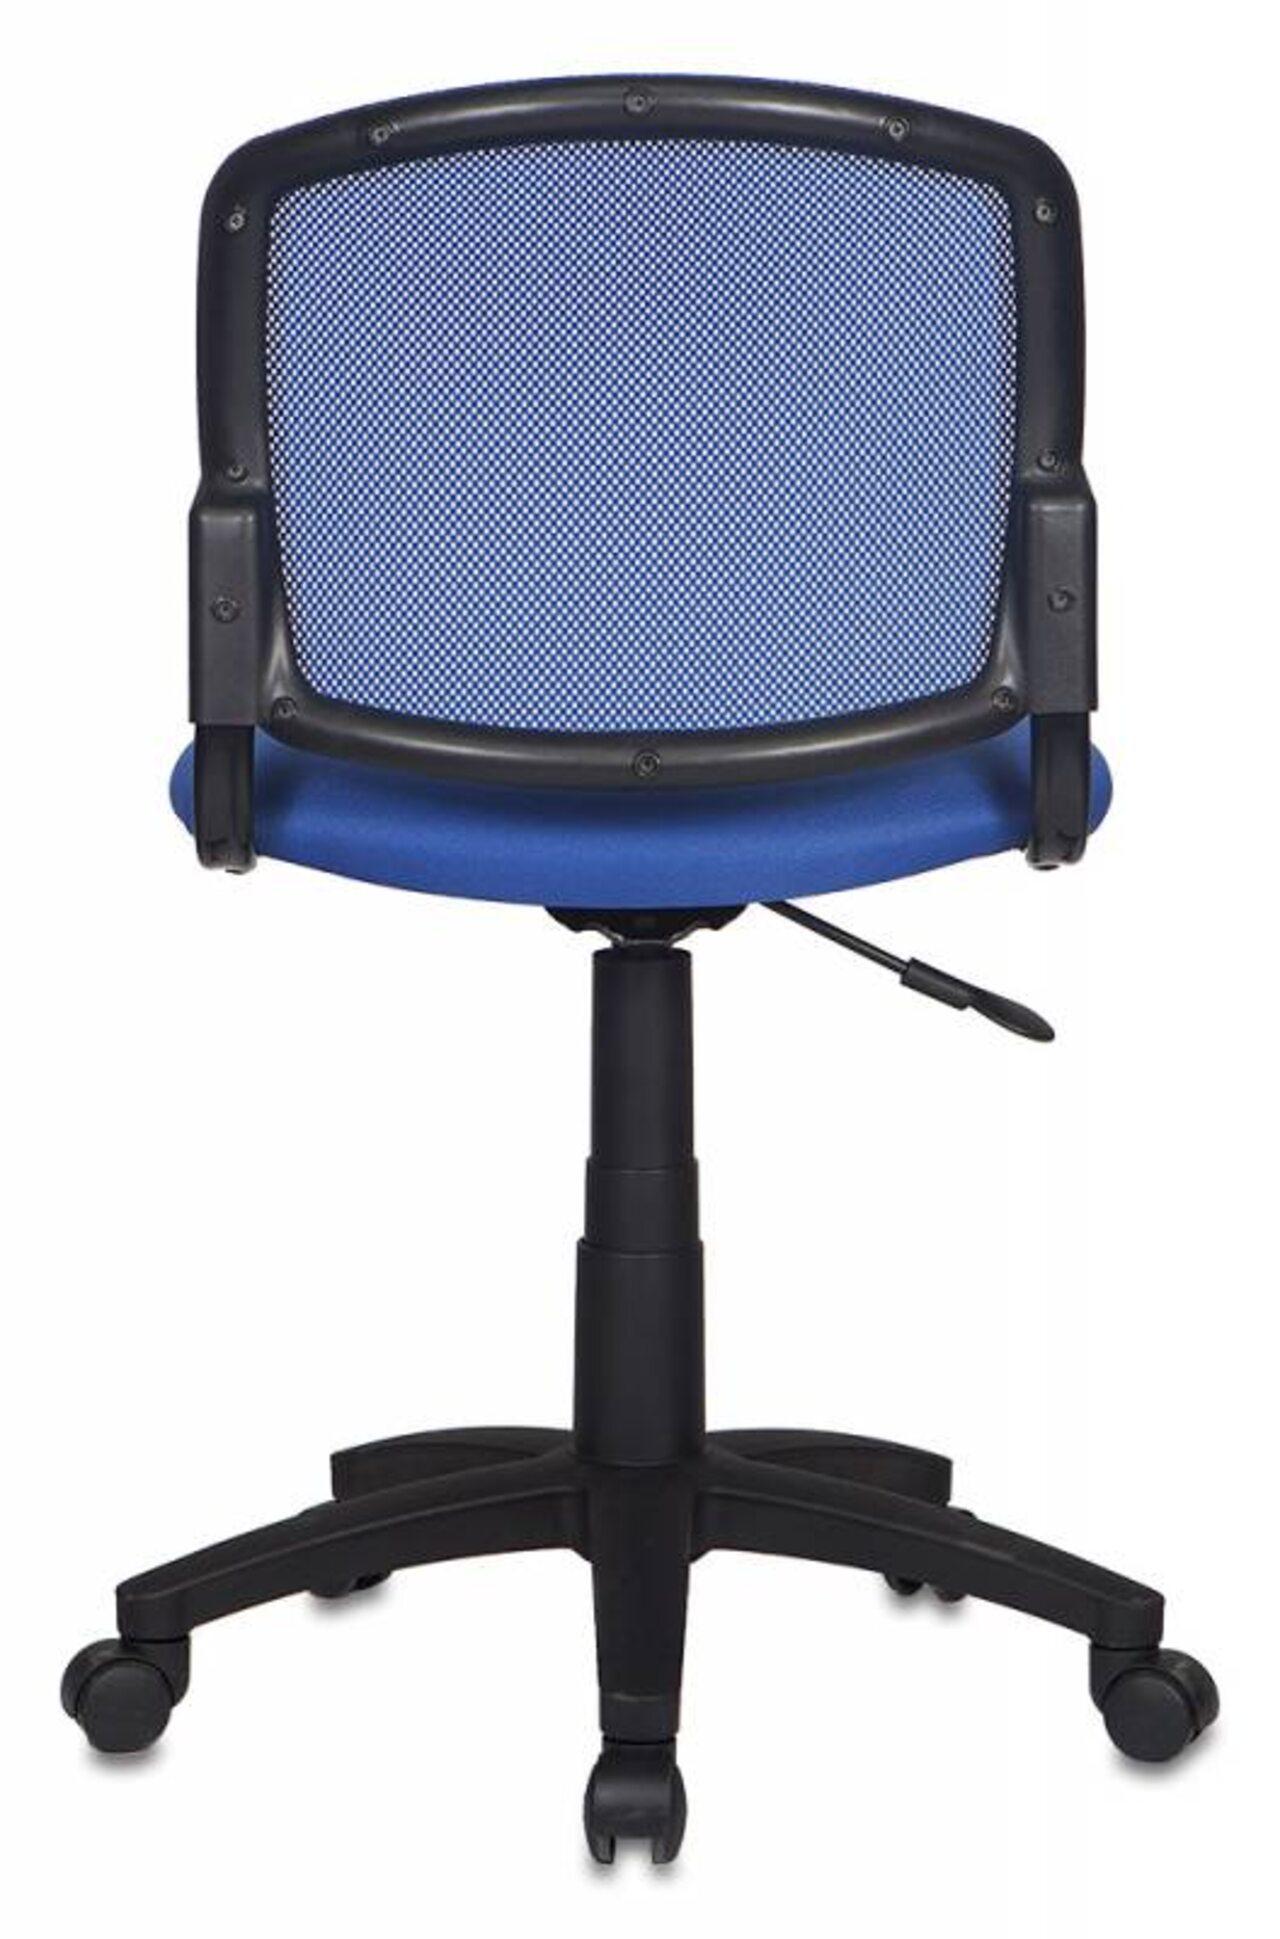 Кресло для персонала CH-296/BL/15-10 - фото 3